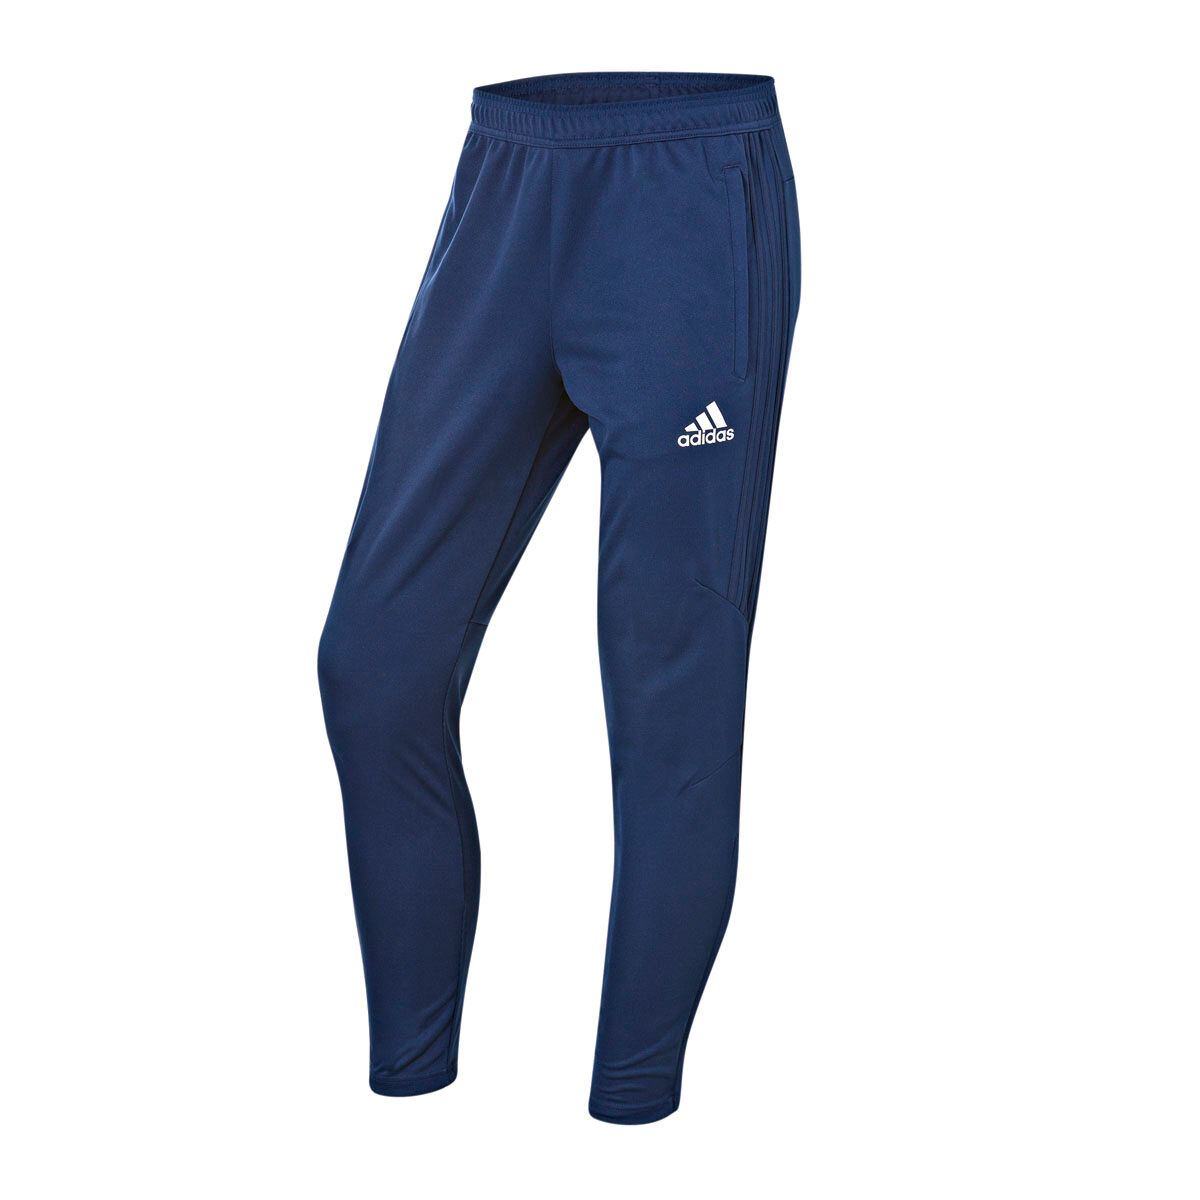 adidas Tiro 17 Training Pants Mens Soccer Pants   Soccer